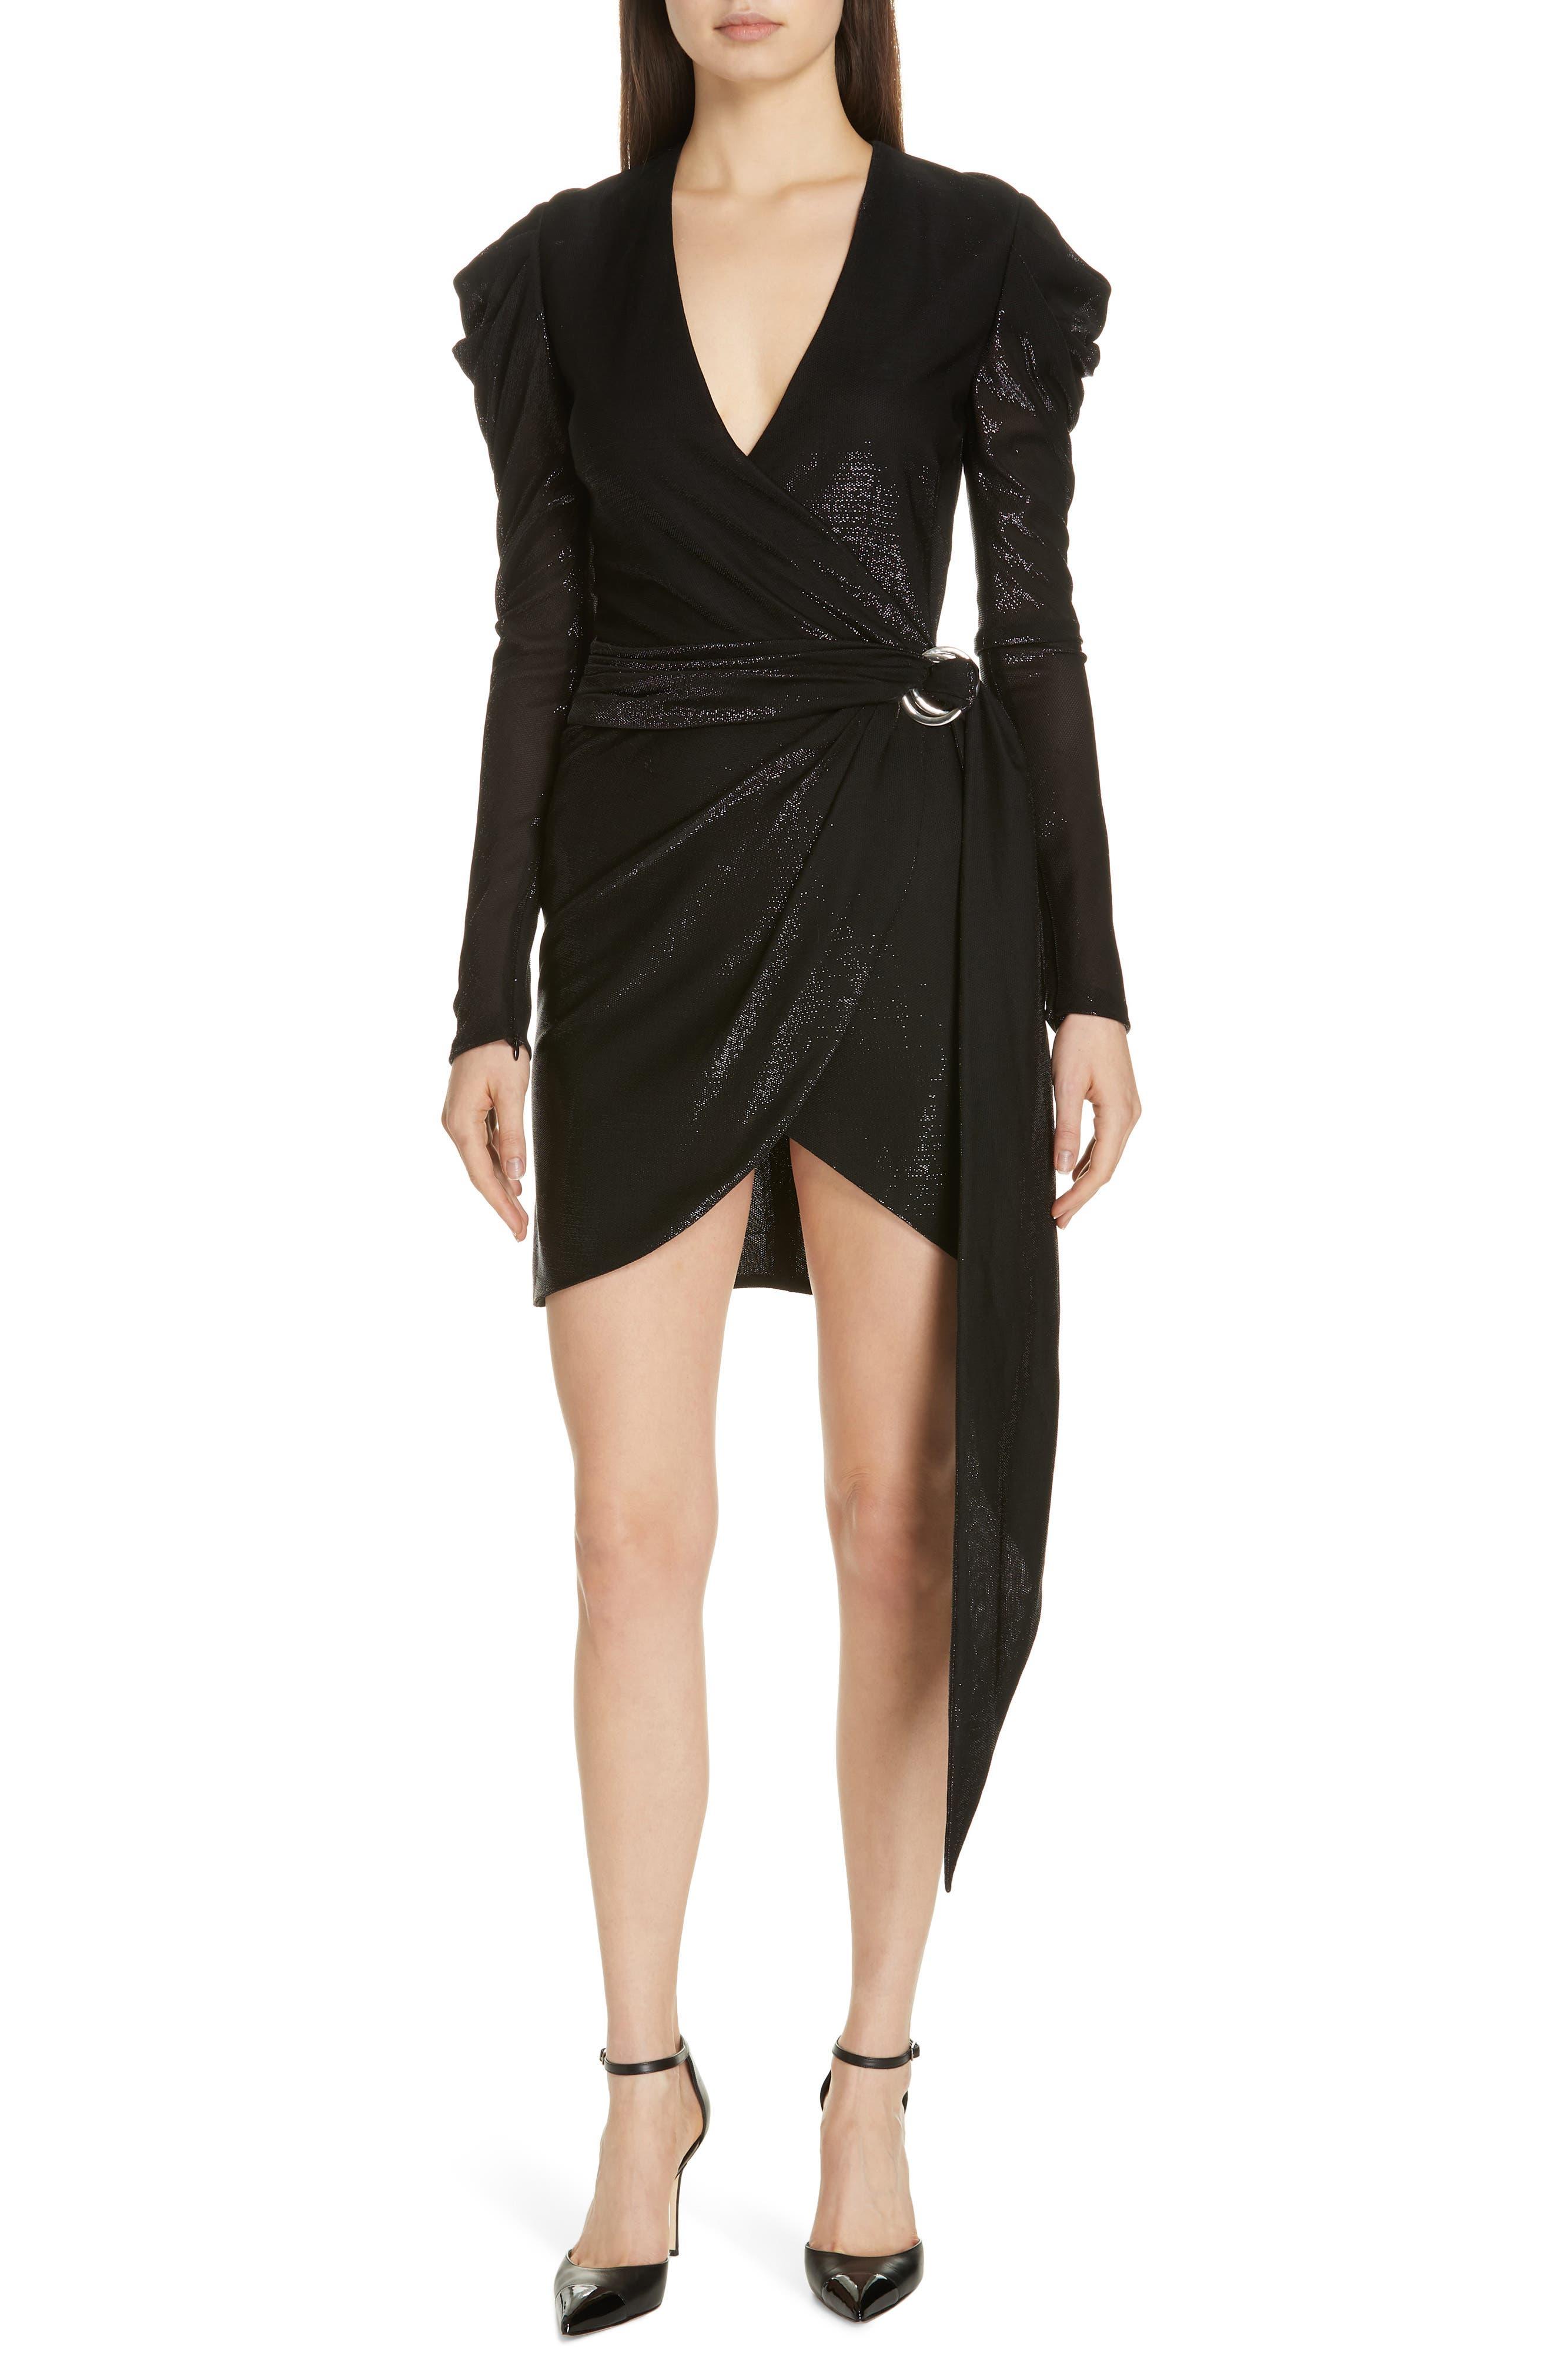 JONATHAN SIMKHAI Metallic Knit Dress, Main, color, BLACK